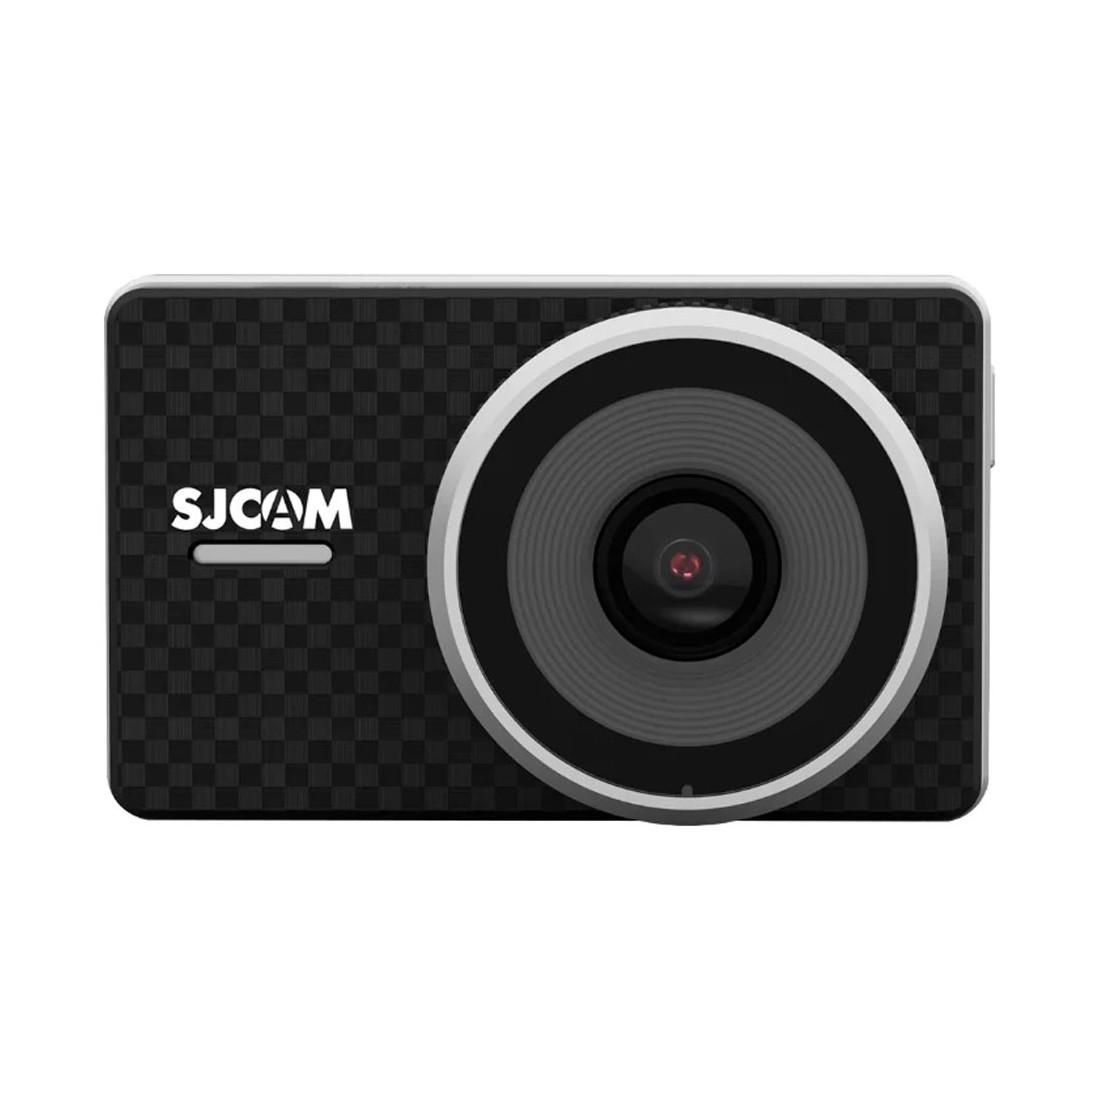 Экшн-камера SJCAM SJDASH PLUS (Black)